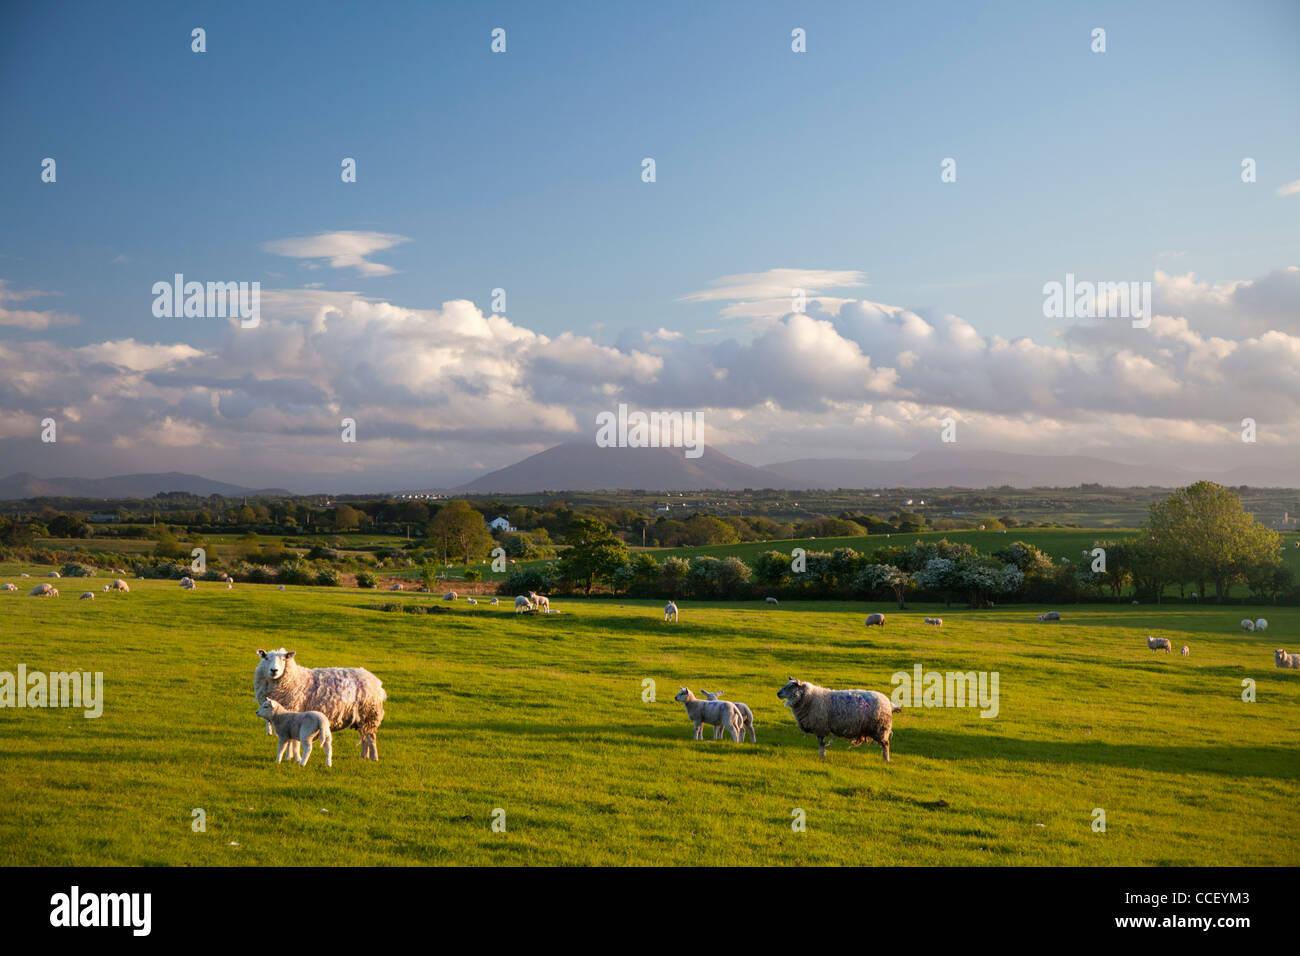 Sheep grazing beneath Nephin Mountain, County Sligo, Ireland. - Stock Image